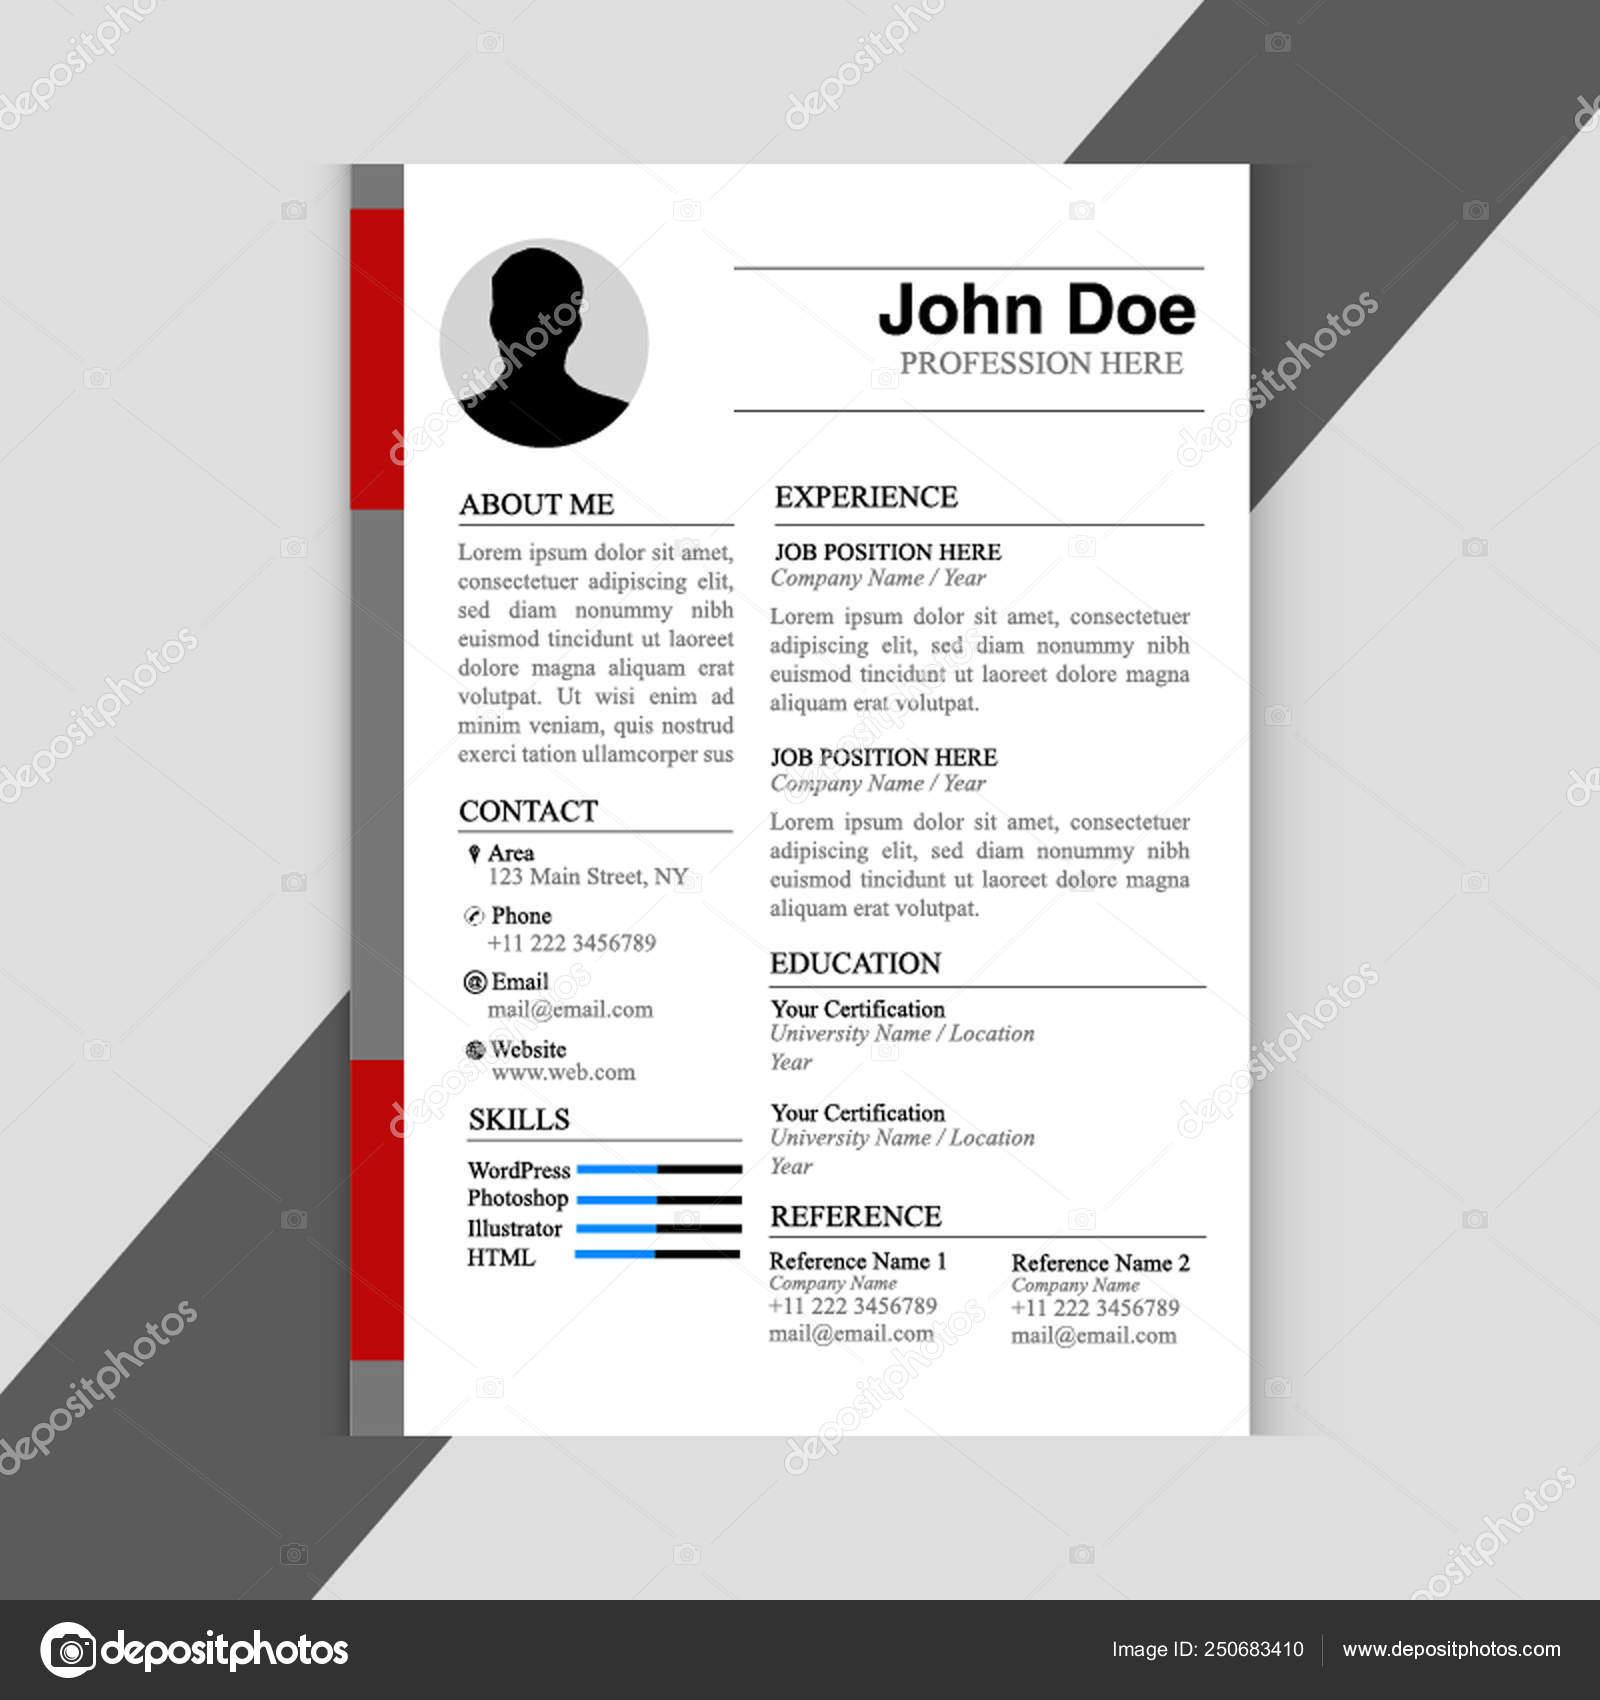 Print Simple Resume Format Design Stock Vector C Rithdeb2019 250683410